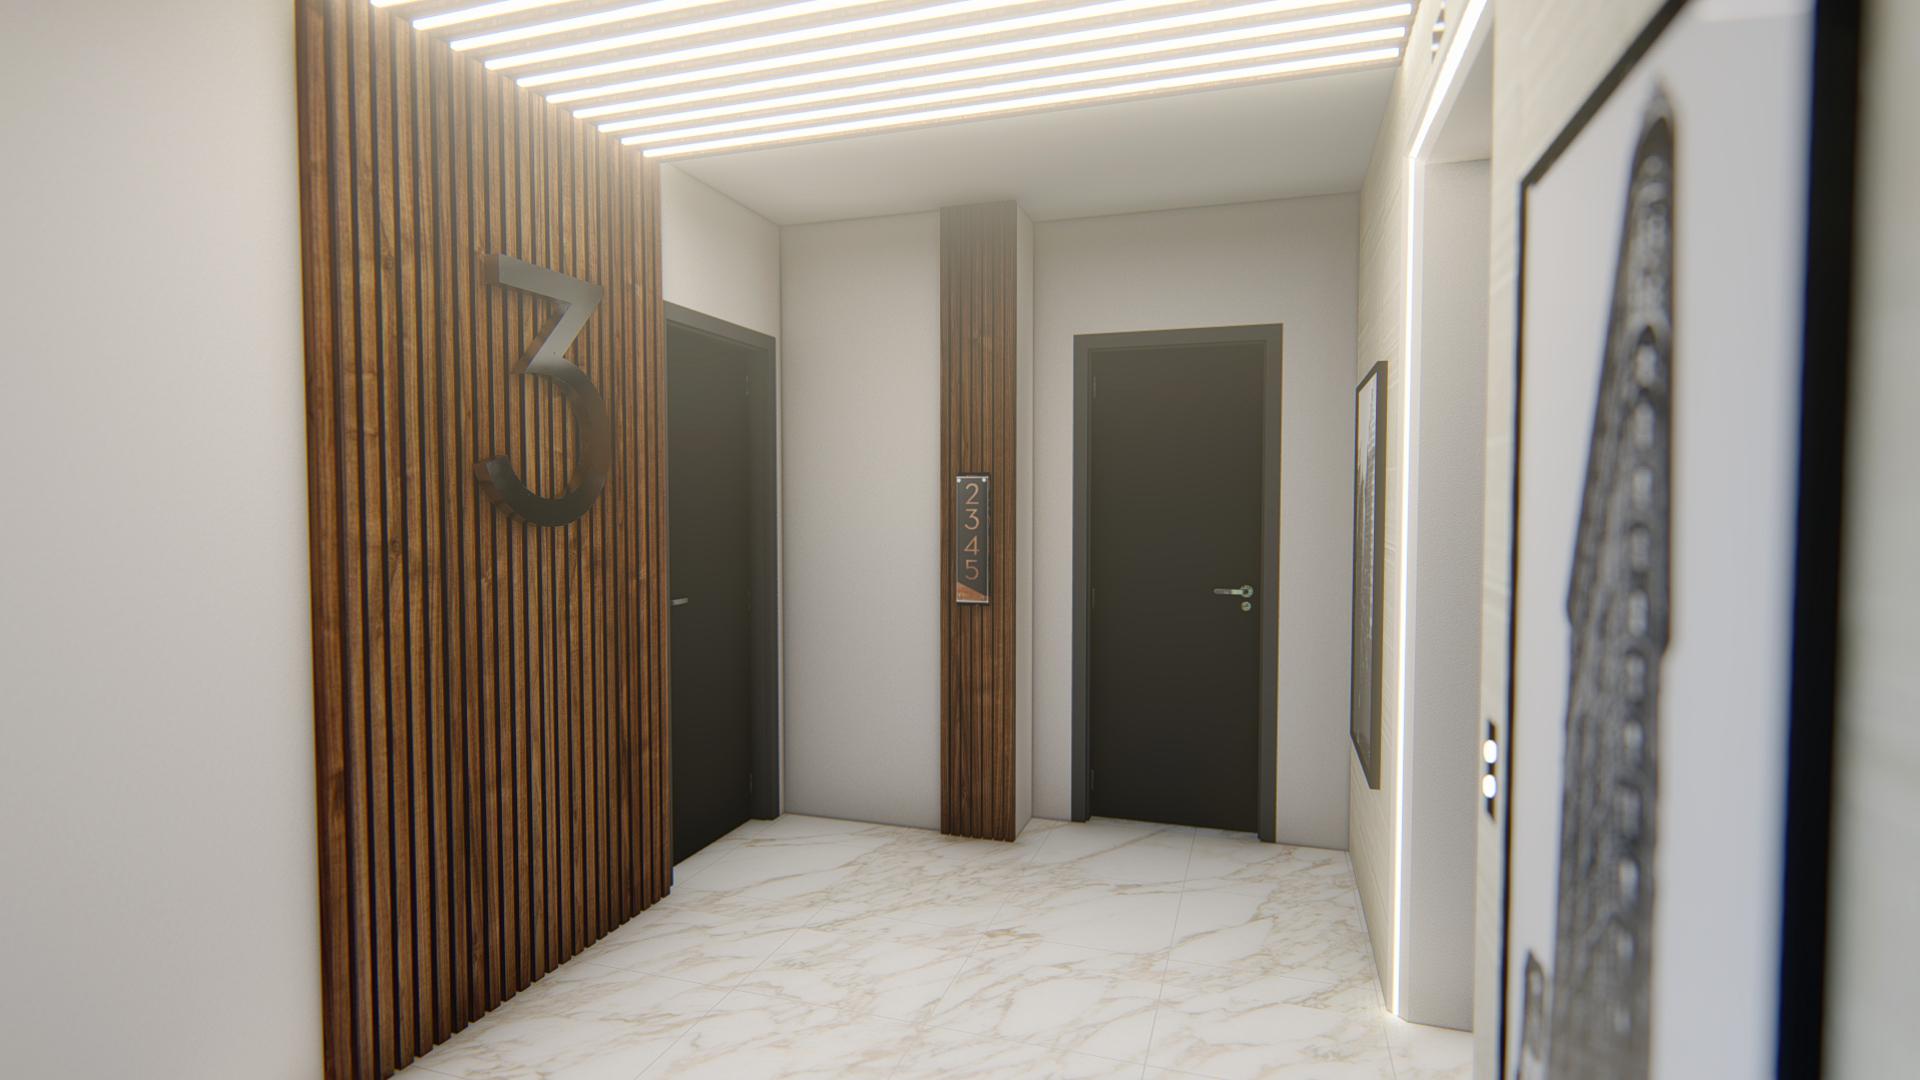 Elevator  Area Corridor View 2.jpg